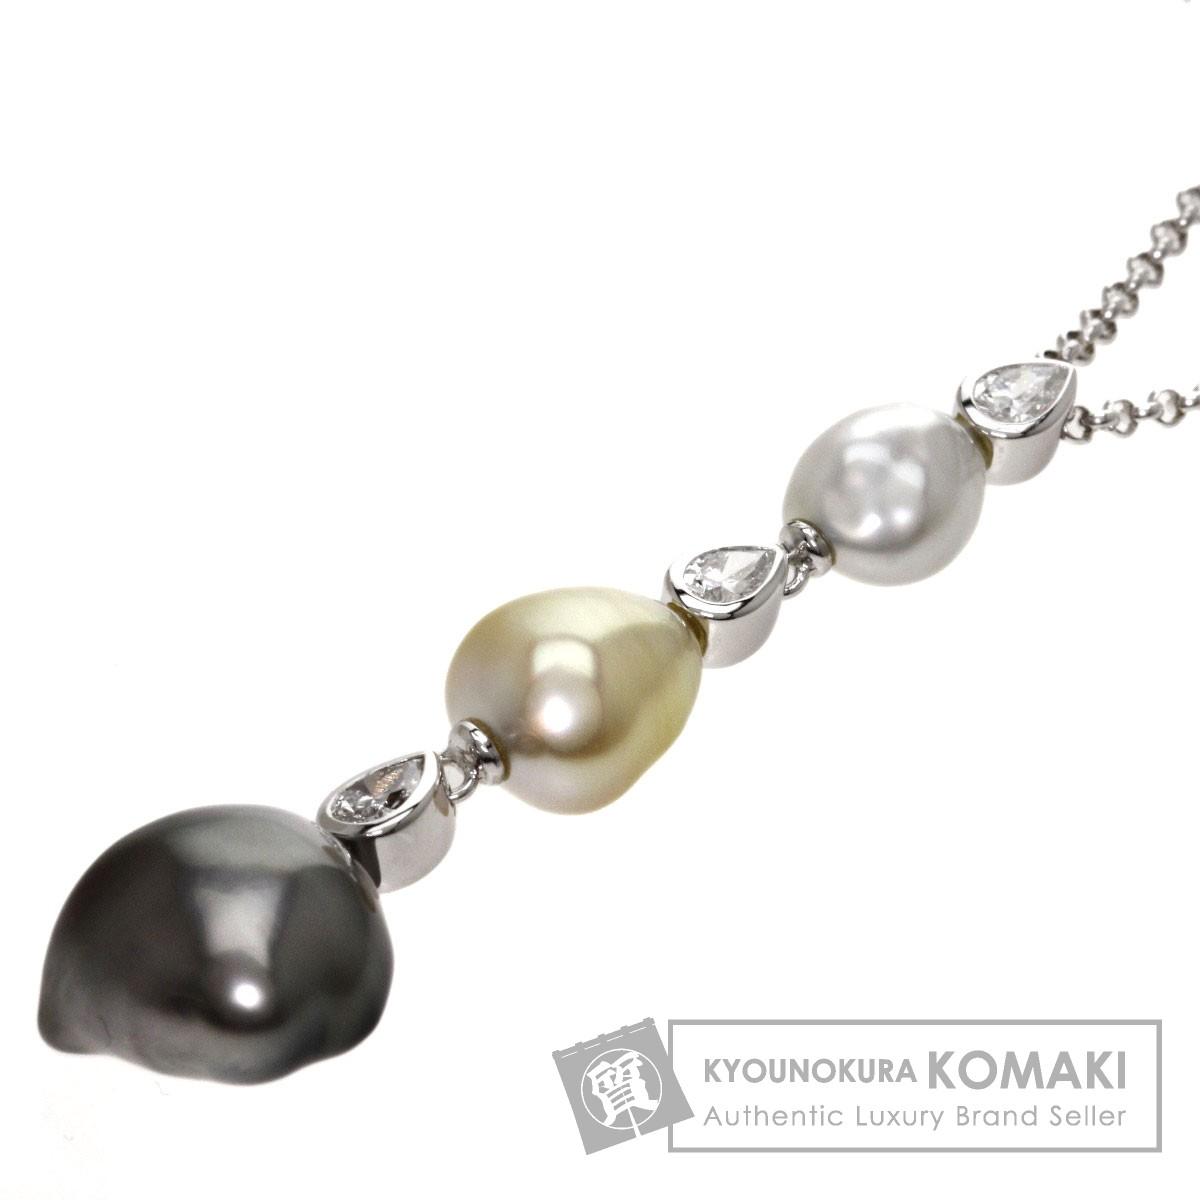 MIKIMOTO 真珠/ダイヤモンド ネックレス K18ホワイトゴールド レディース 【中古】【ミキモト】